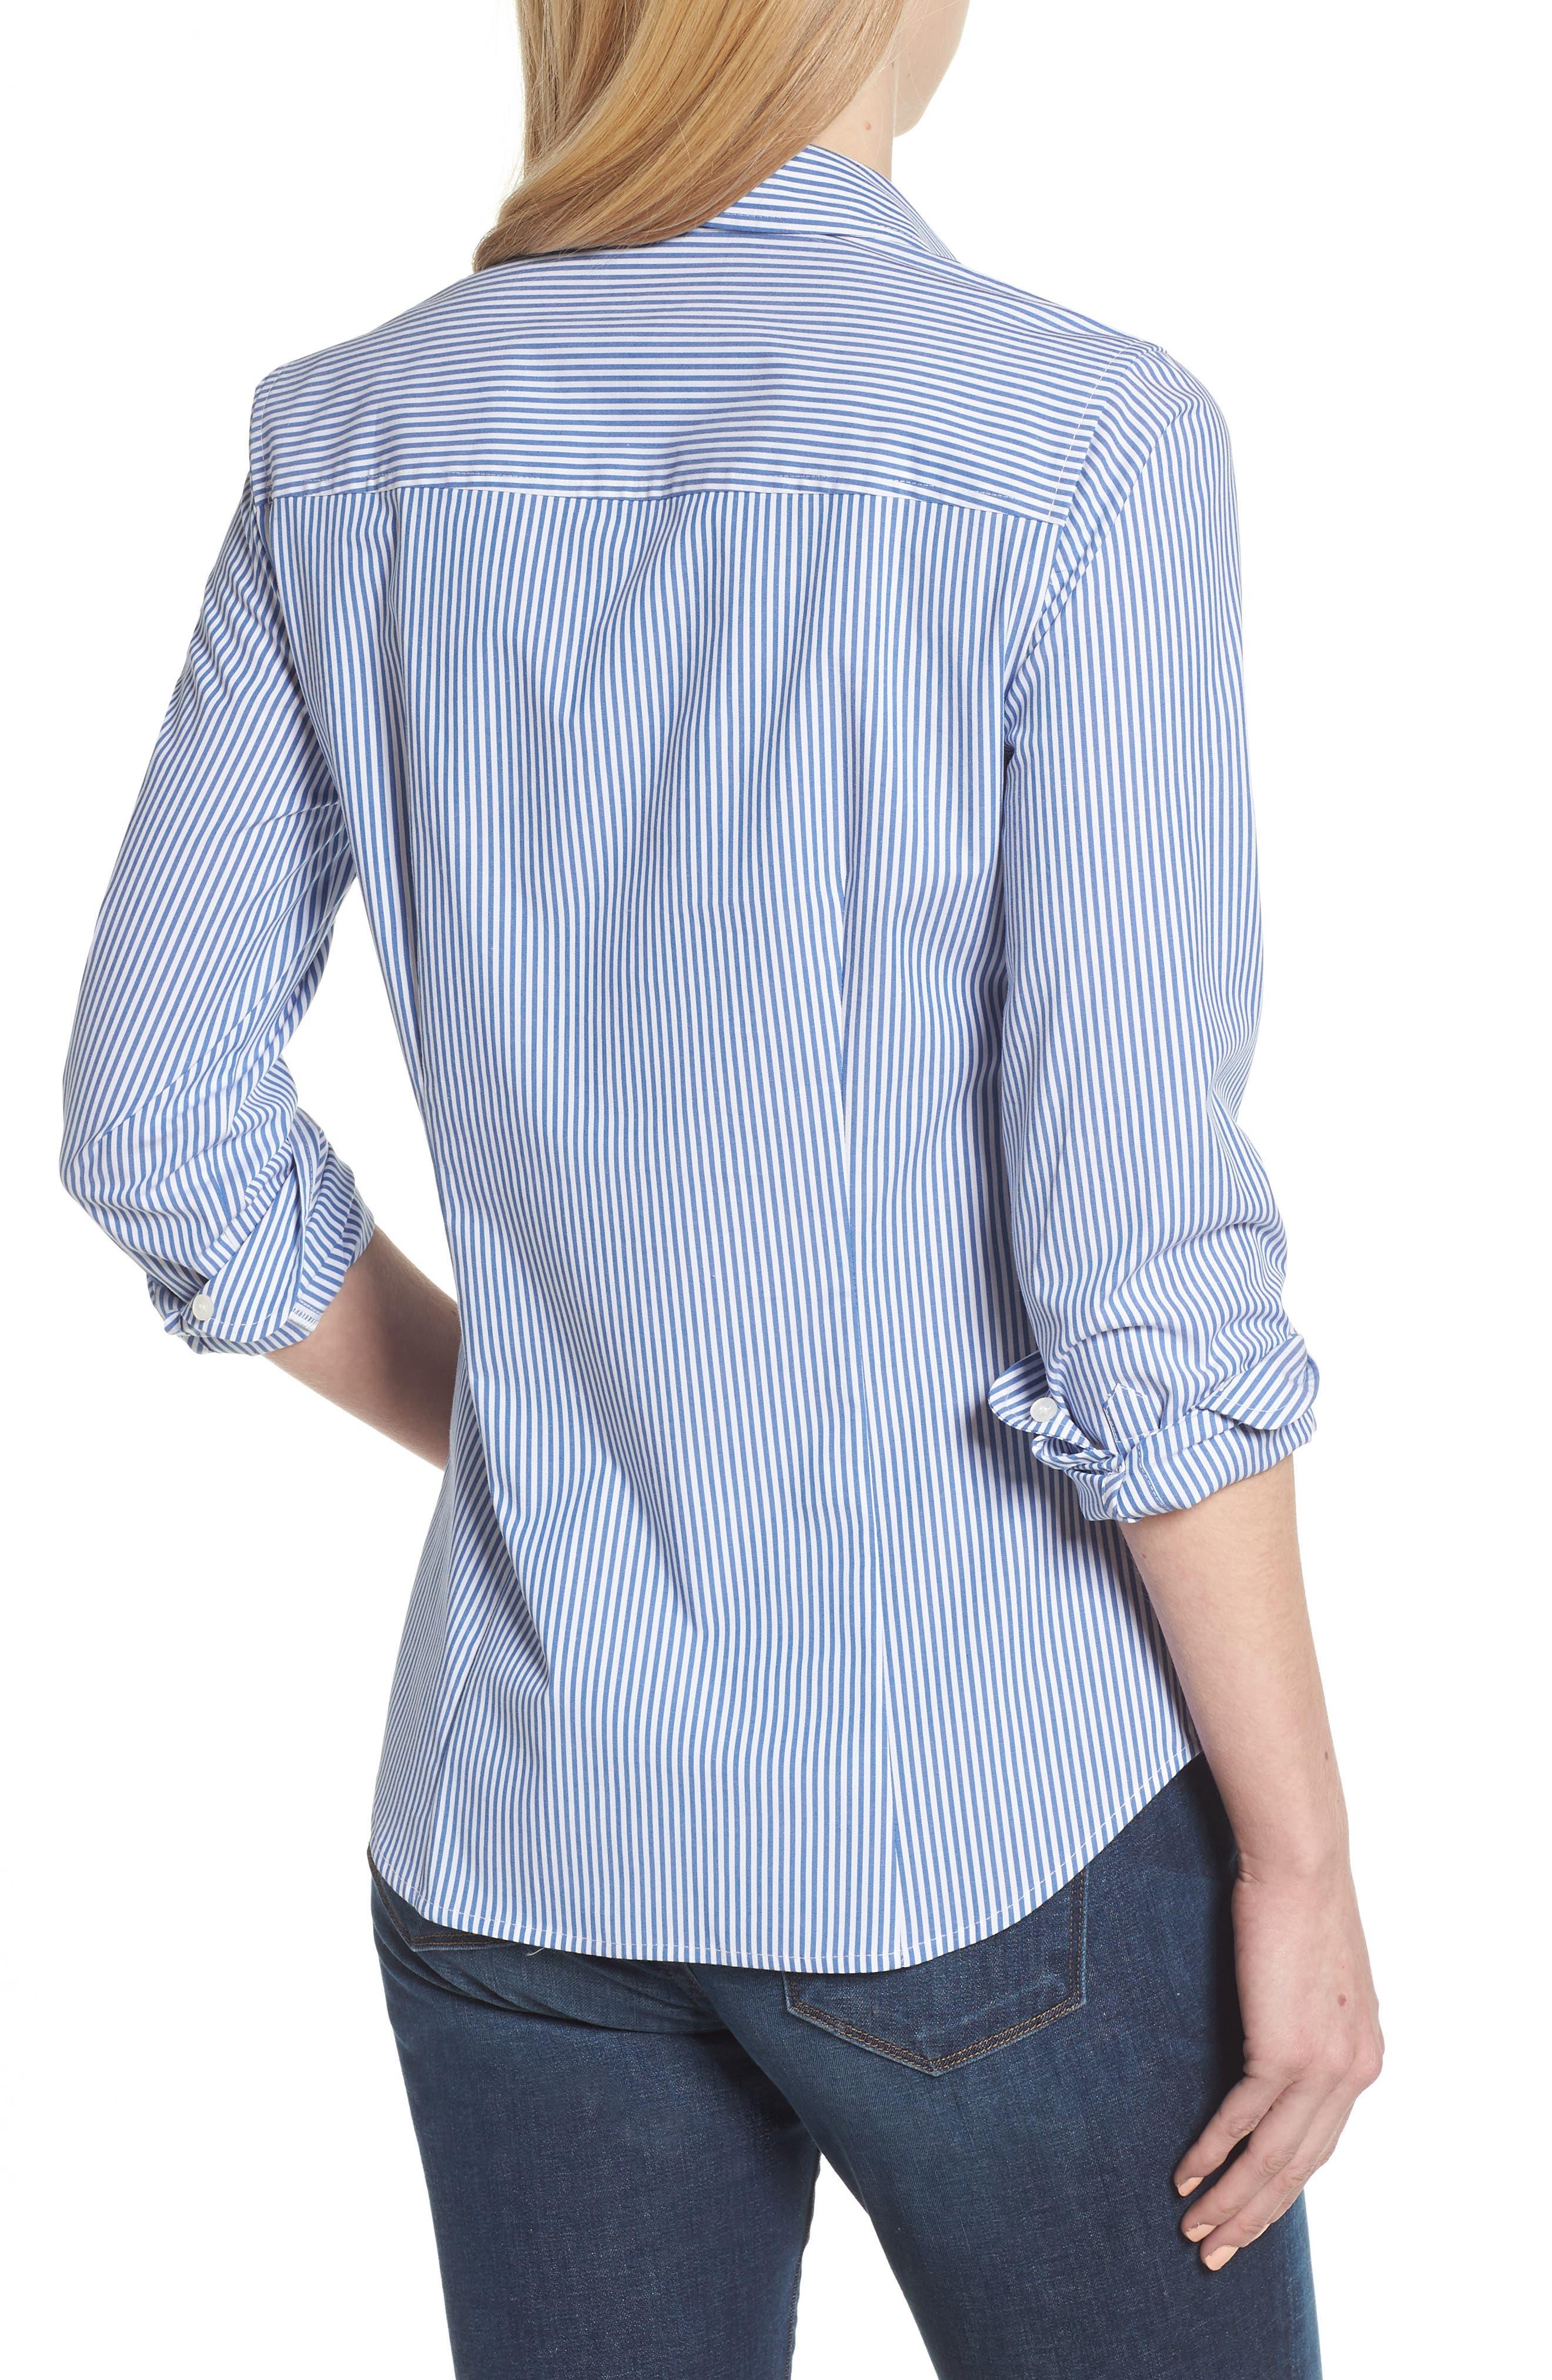 Alternate Image 3  - J.Crew Perfect Classic Stripe Stretch Cotton Shirt (Regular & Petite)